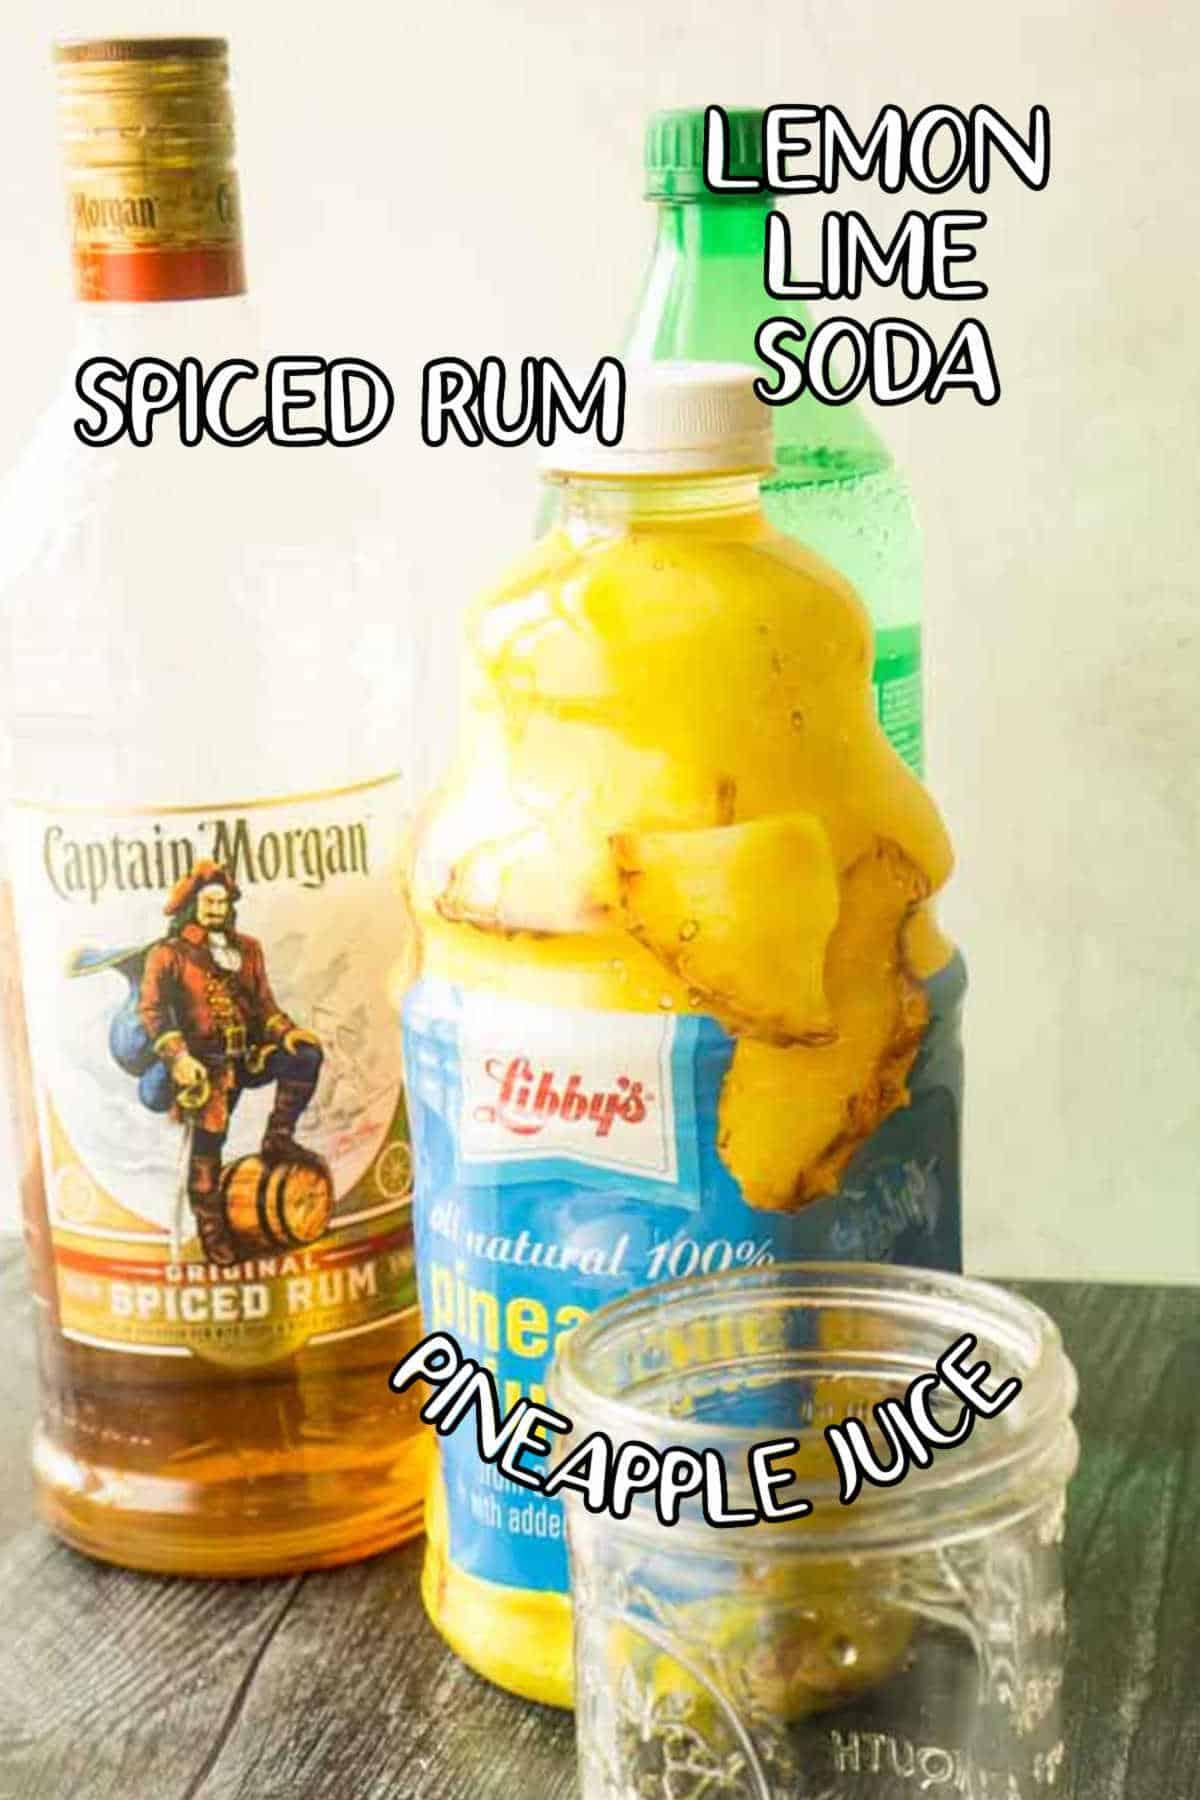 bottles of spiced rum, bottled pineapple juice, and sprite